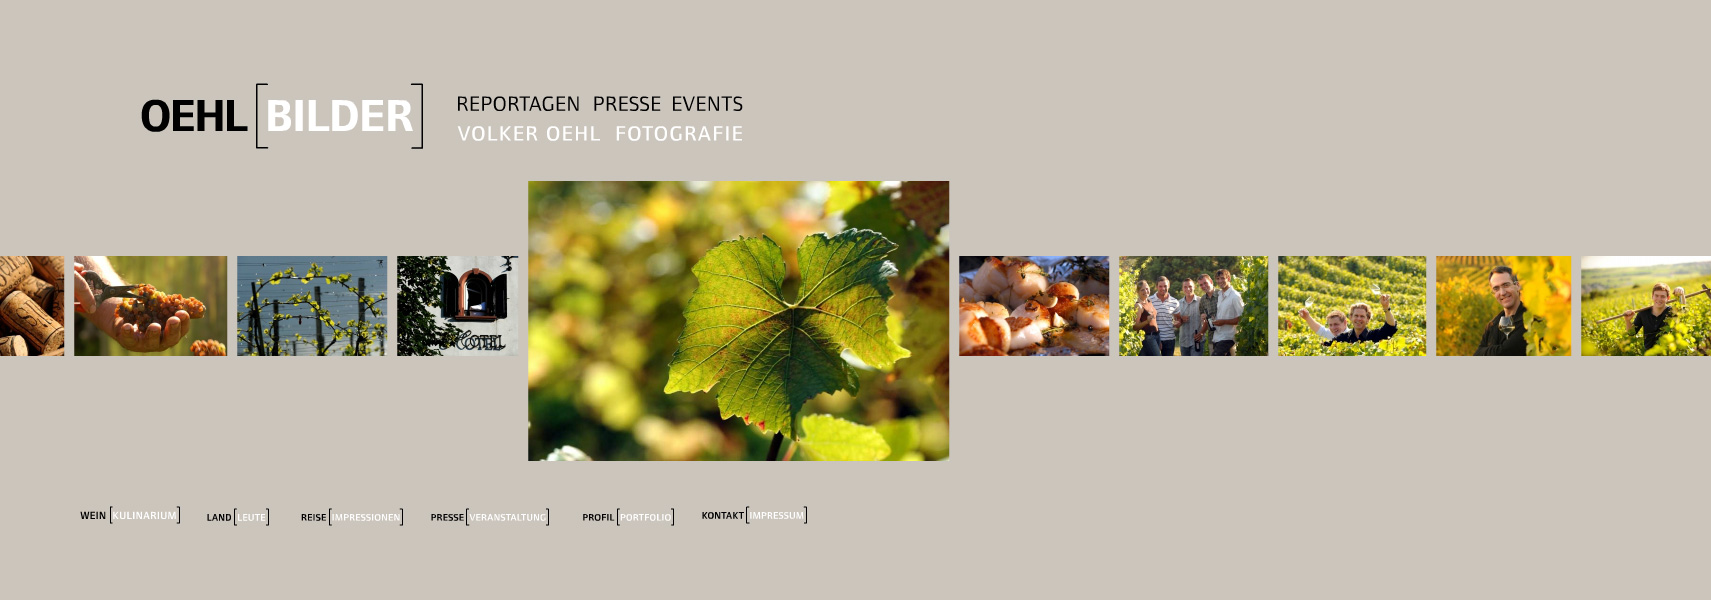 Oehlbilder.com. Flash website a fotós Volker Oehl. Saját készítésű CMS.